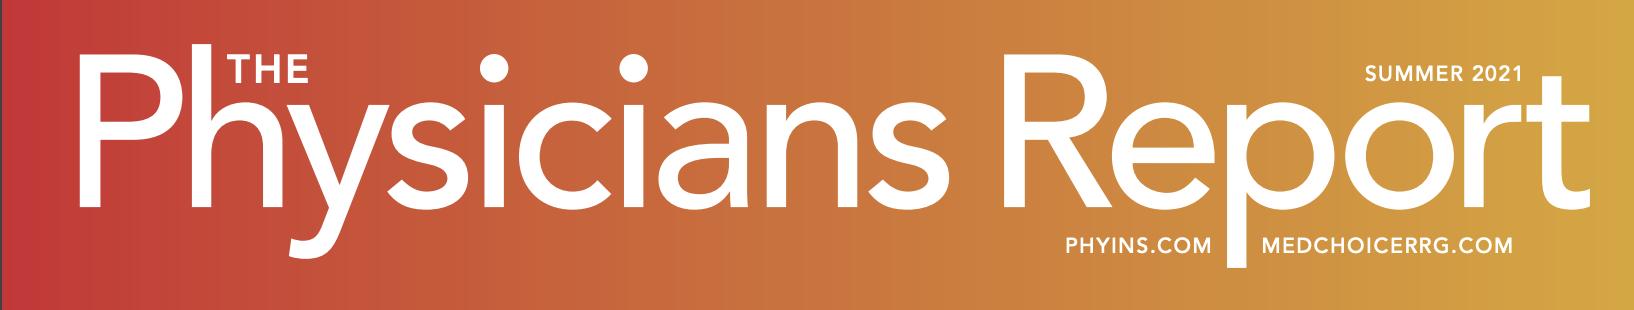 Physicians Report logo